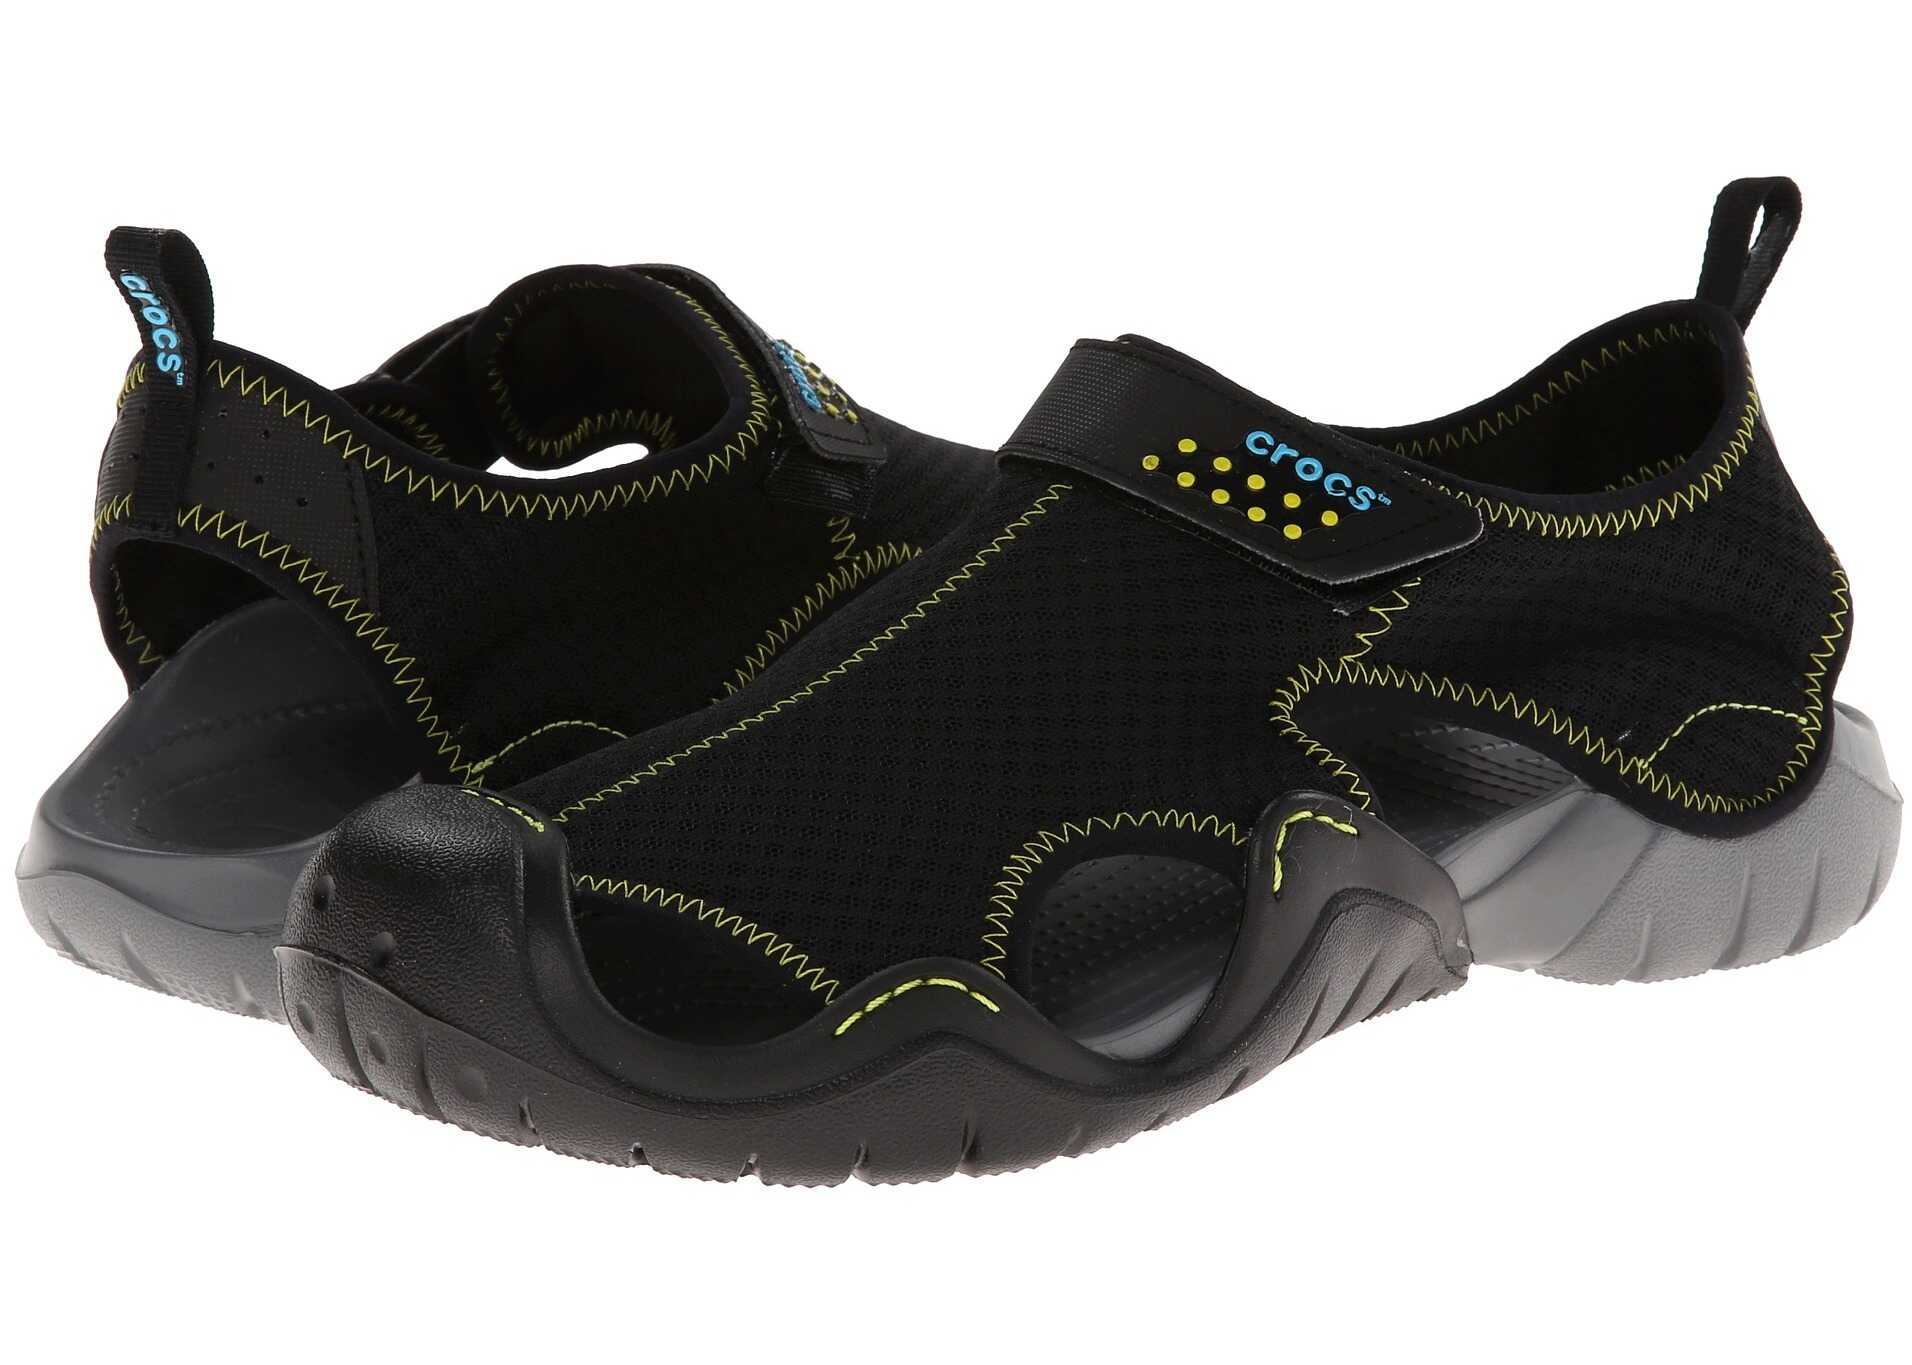 Crocs Swiftwater Sandal Black/Charcoal